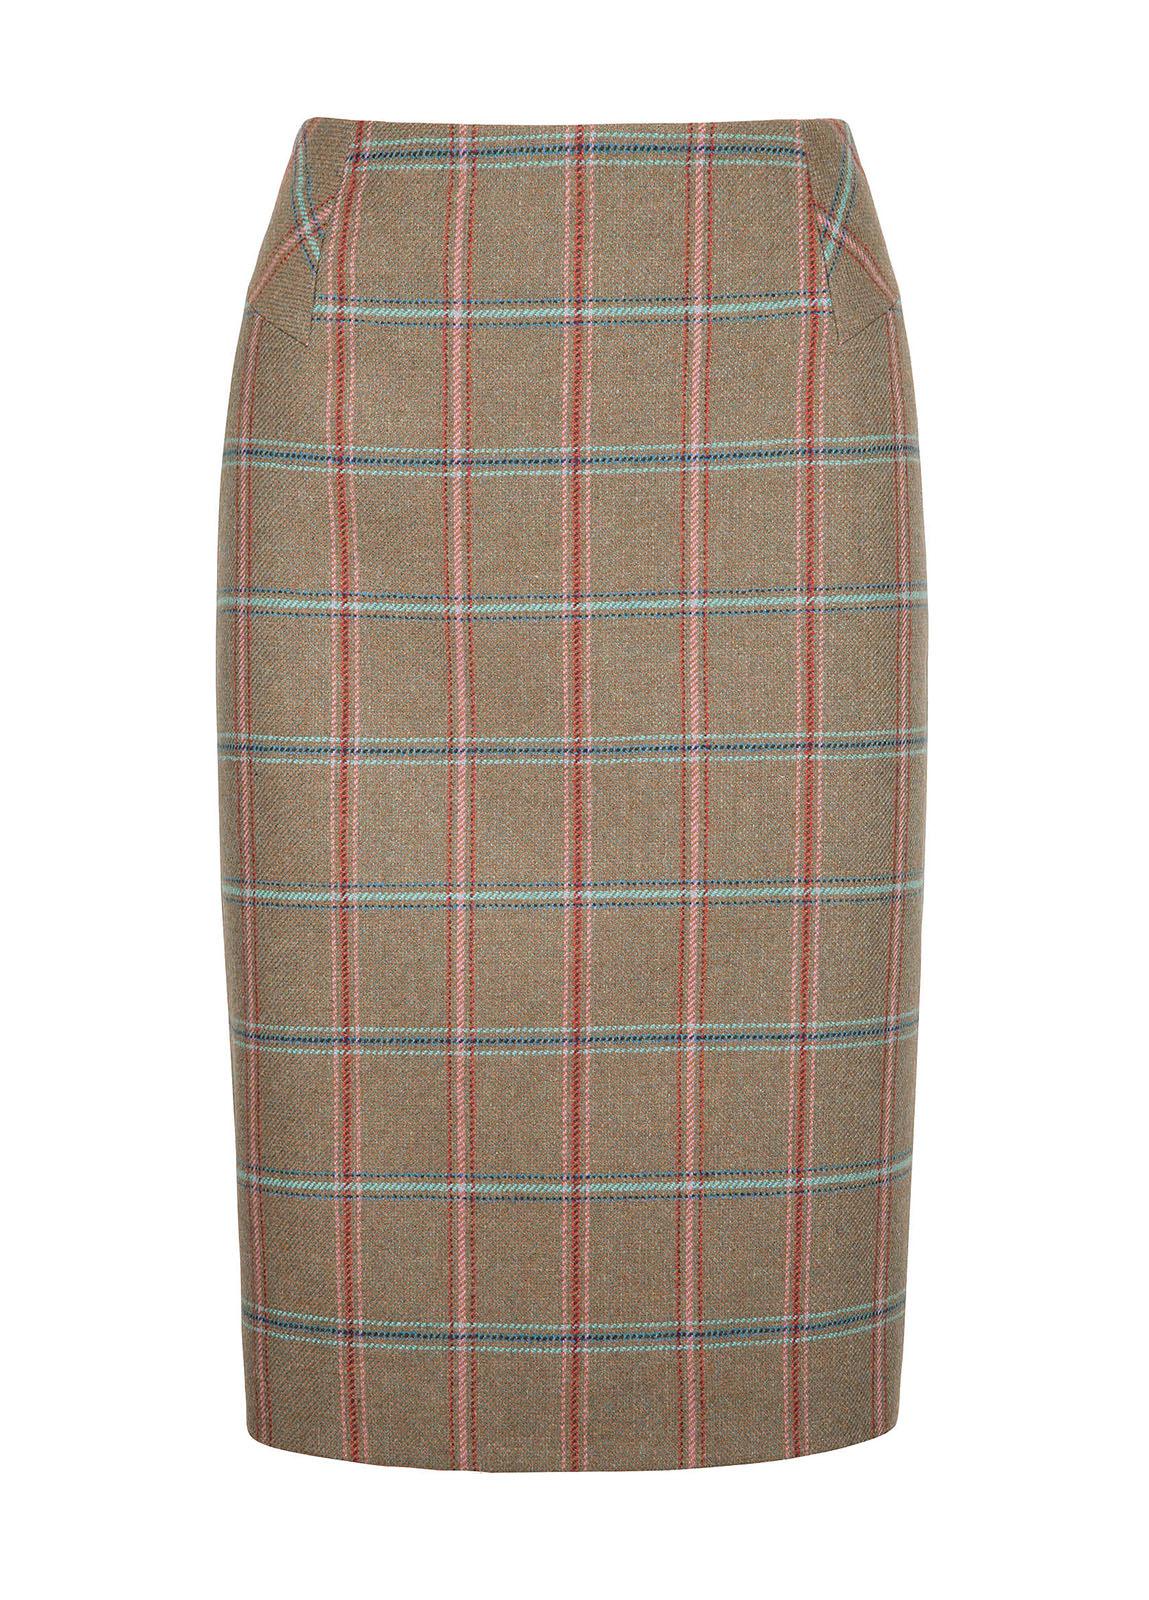 Fern Tweed Skirt - Olive